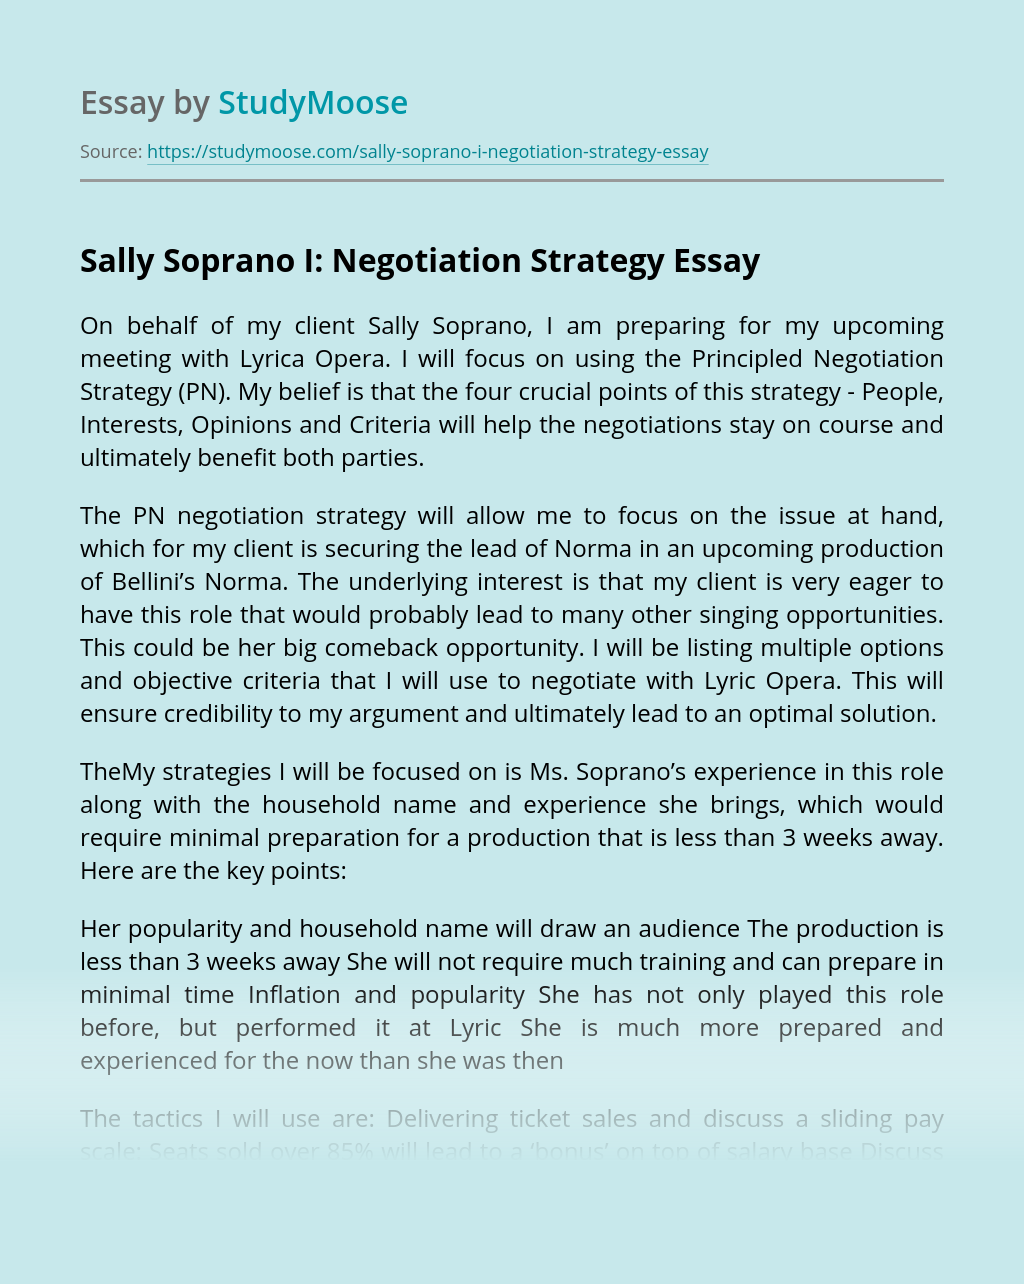 Sally Soprano I: Negotiation Strategy